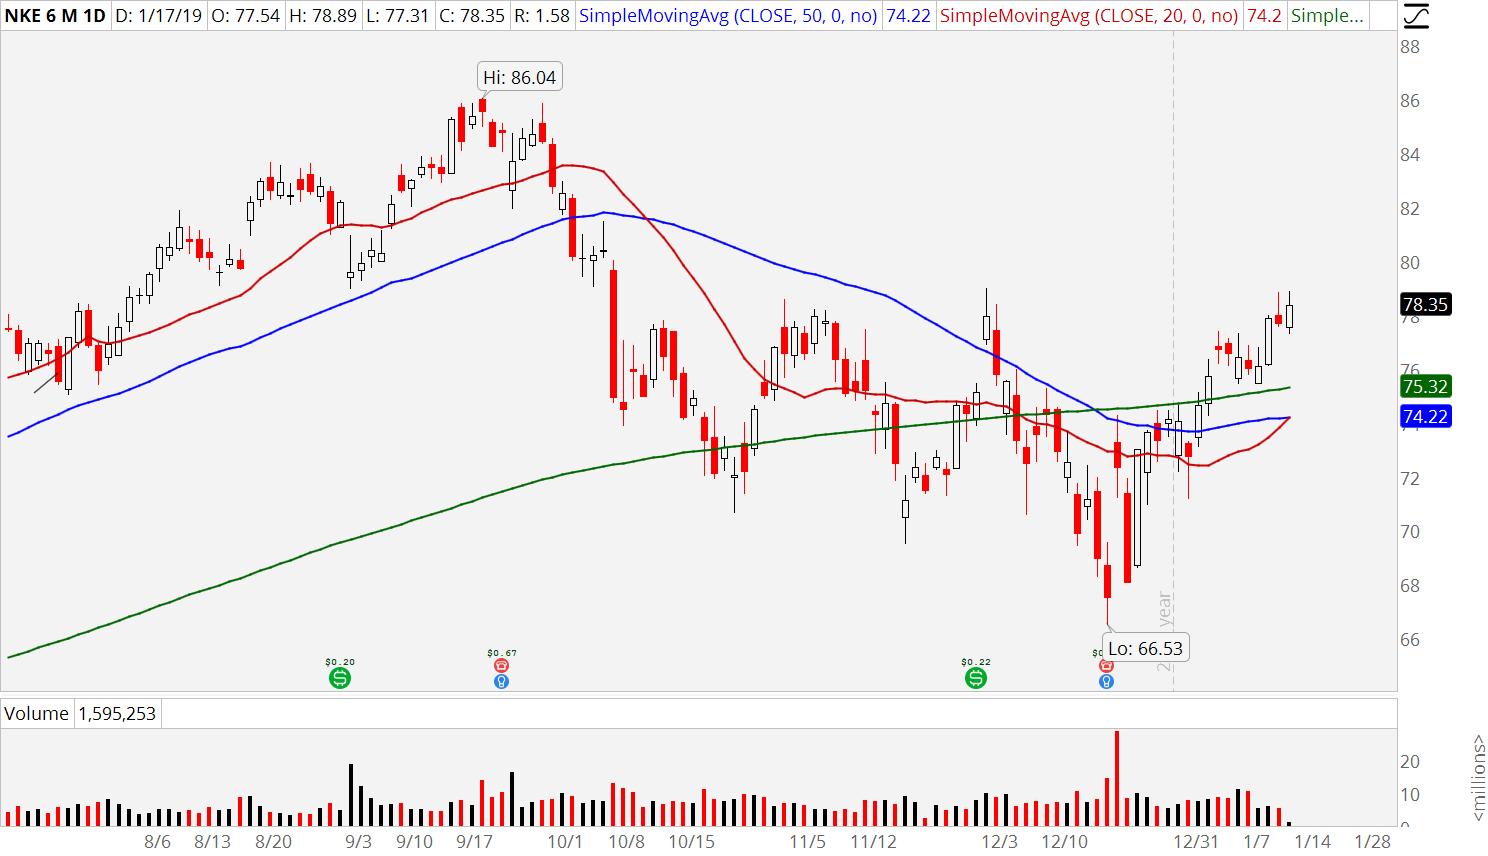 3 Retail Stocks to Buy: Nike (NKE)